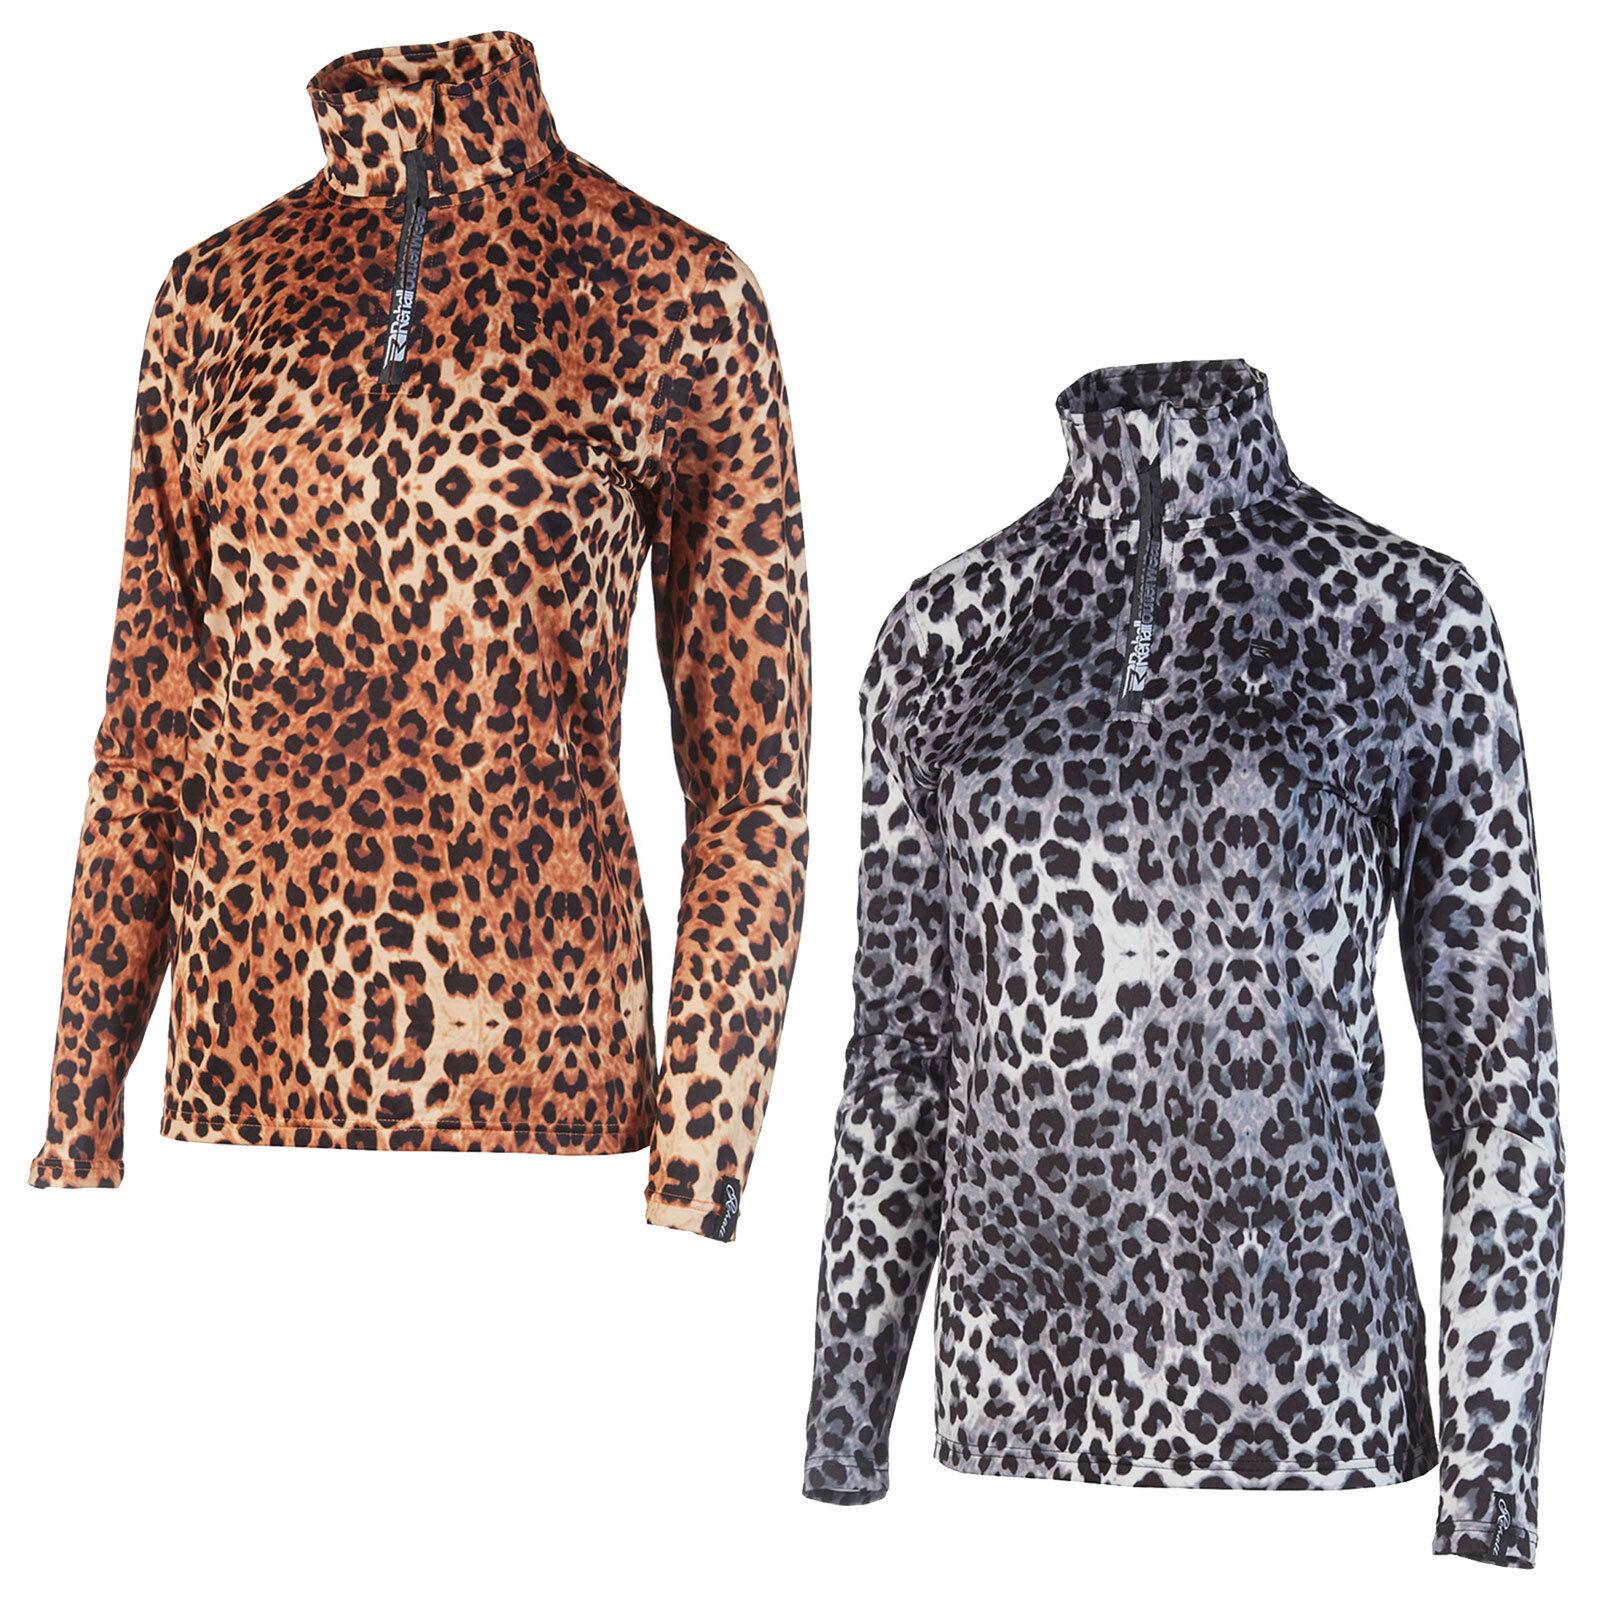 REHALL Florence-R printed  Ski Fleece Ladies Ski Sweater Mid Layer Long Sleeve Shirt  discounts and more